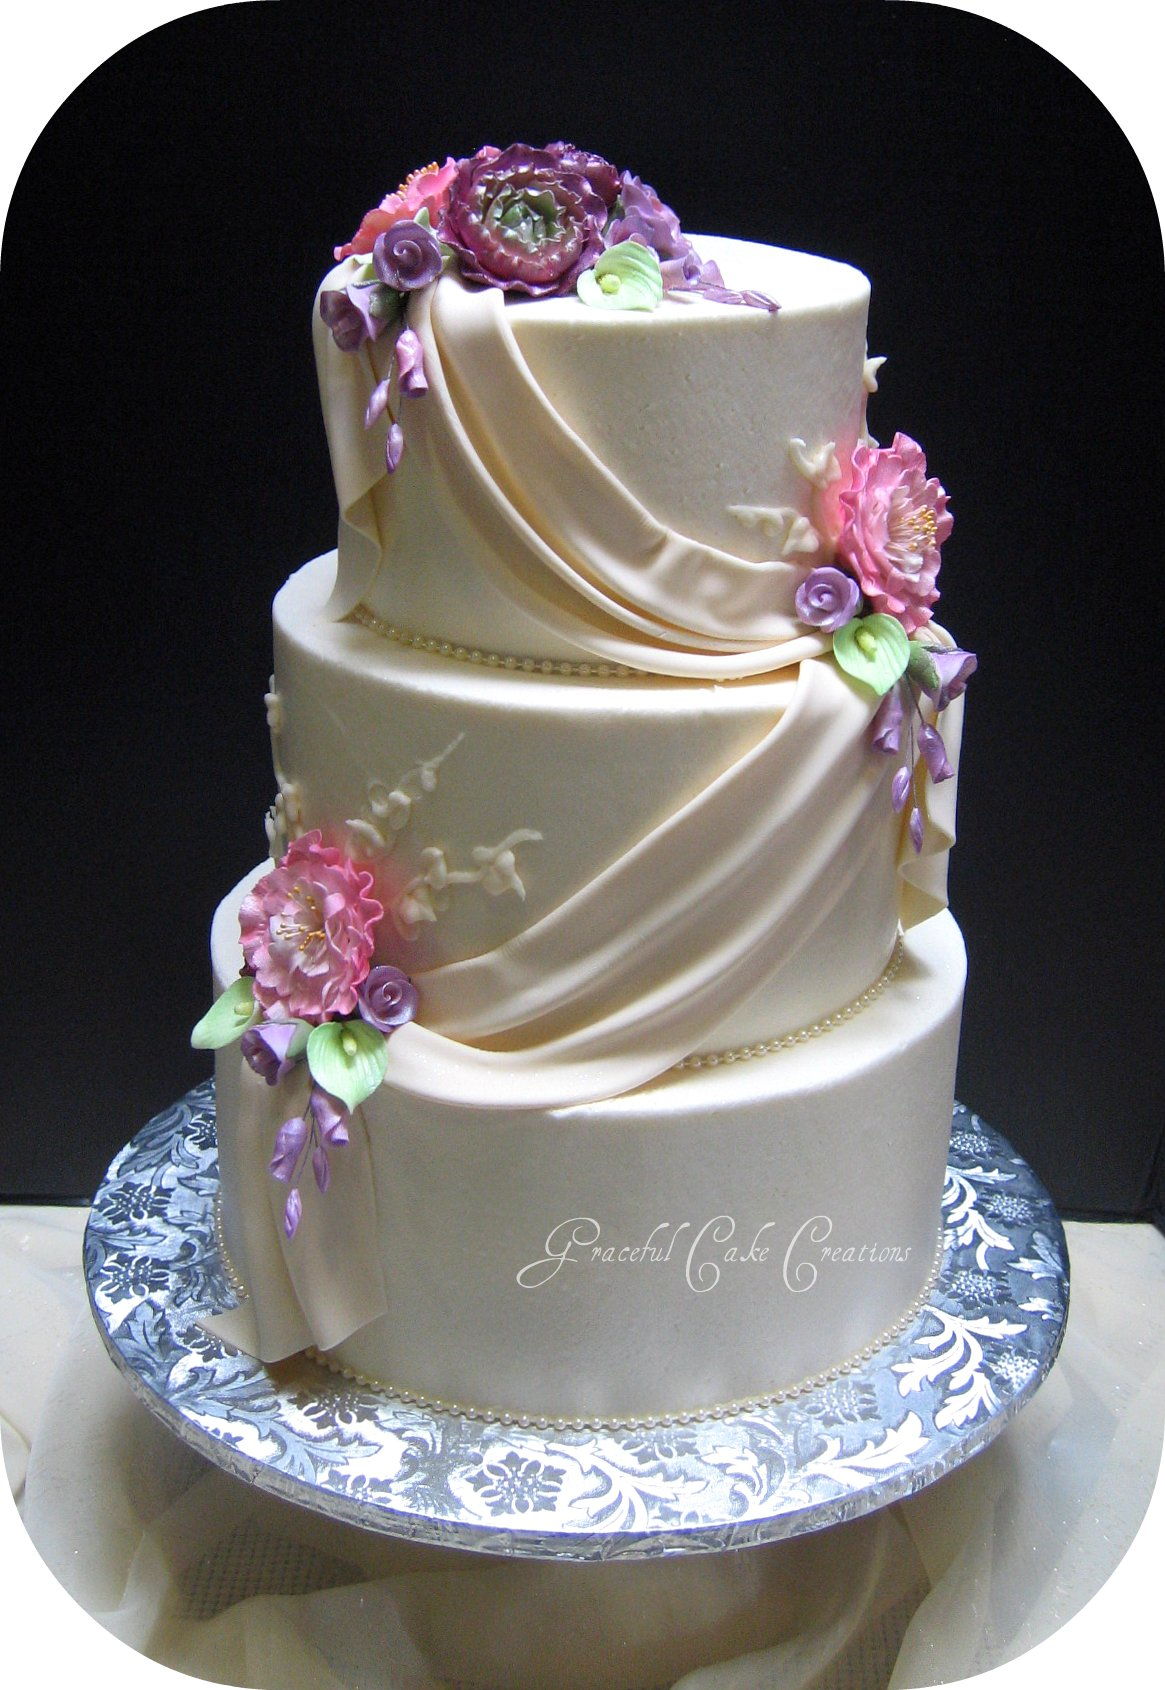 Elegant Ivory Wedding Cake with Fondant Swags | Flickr ...